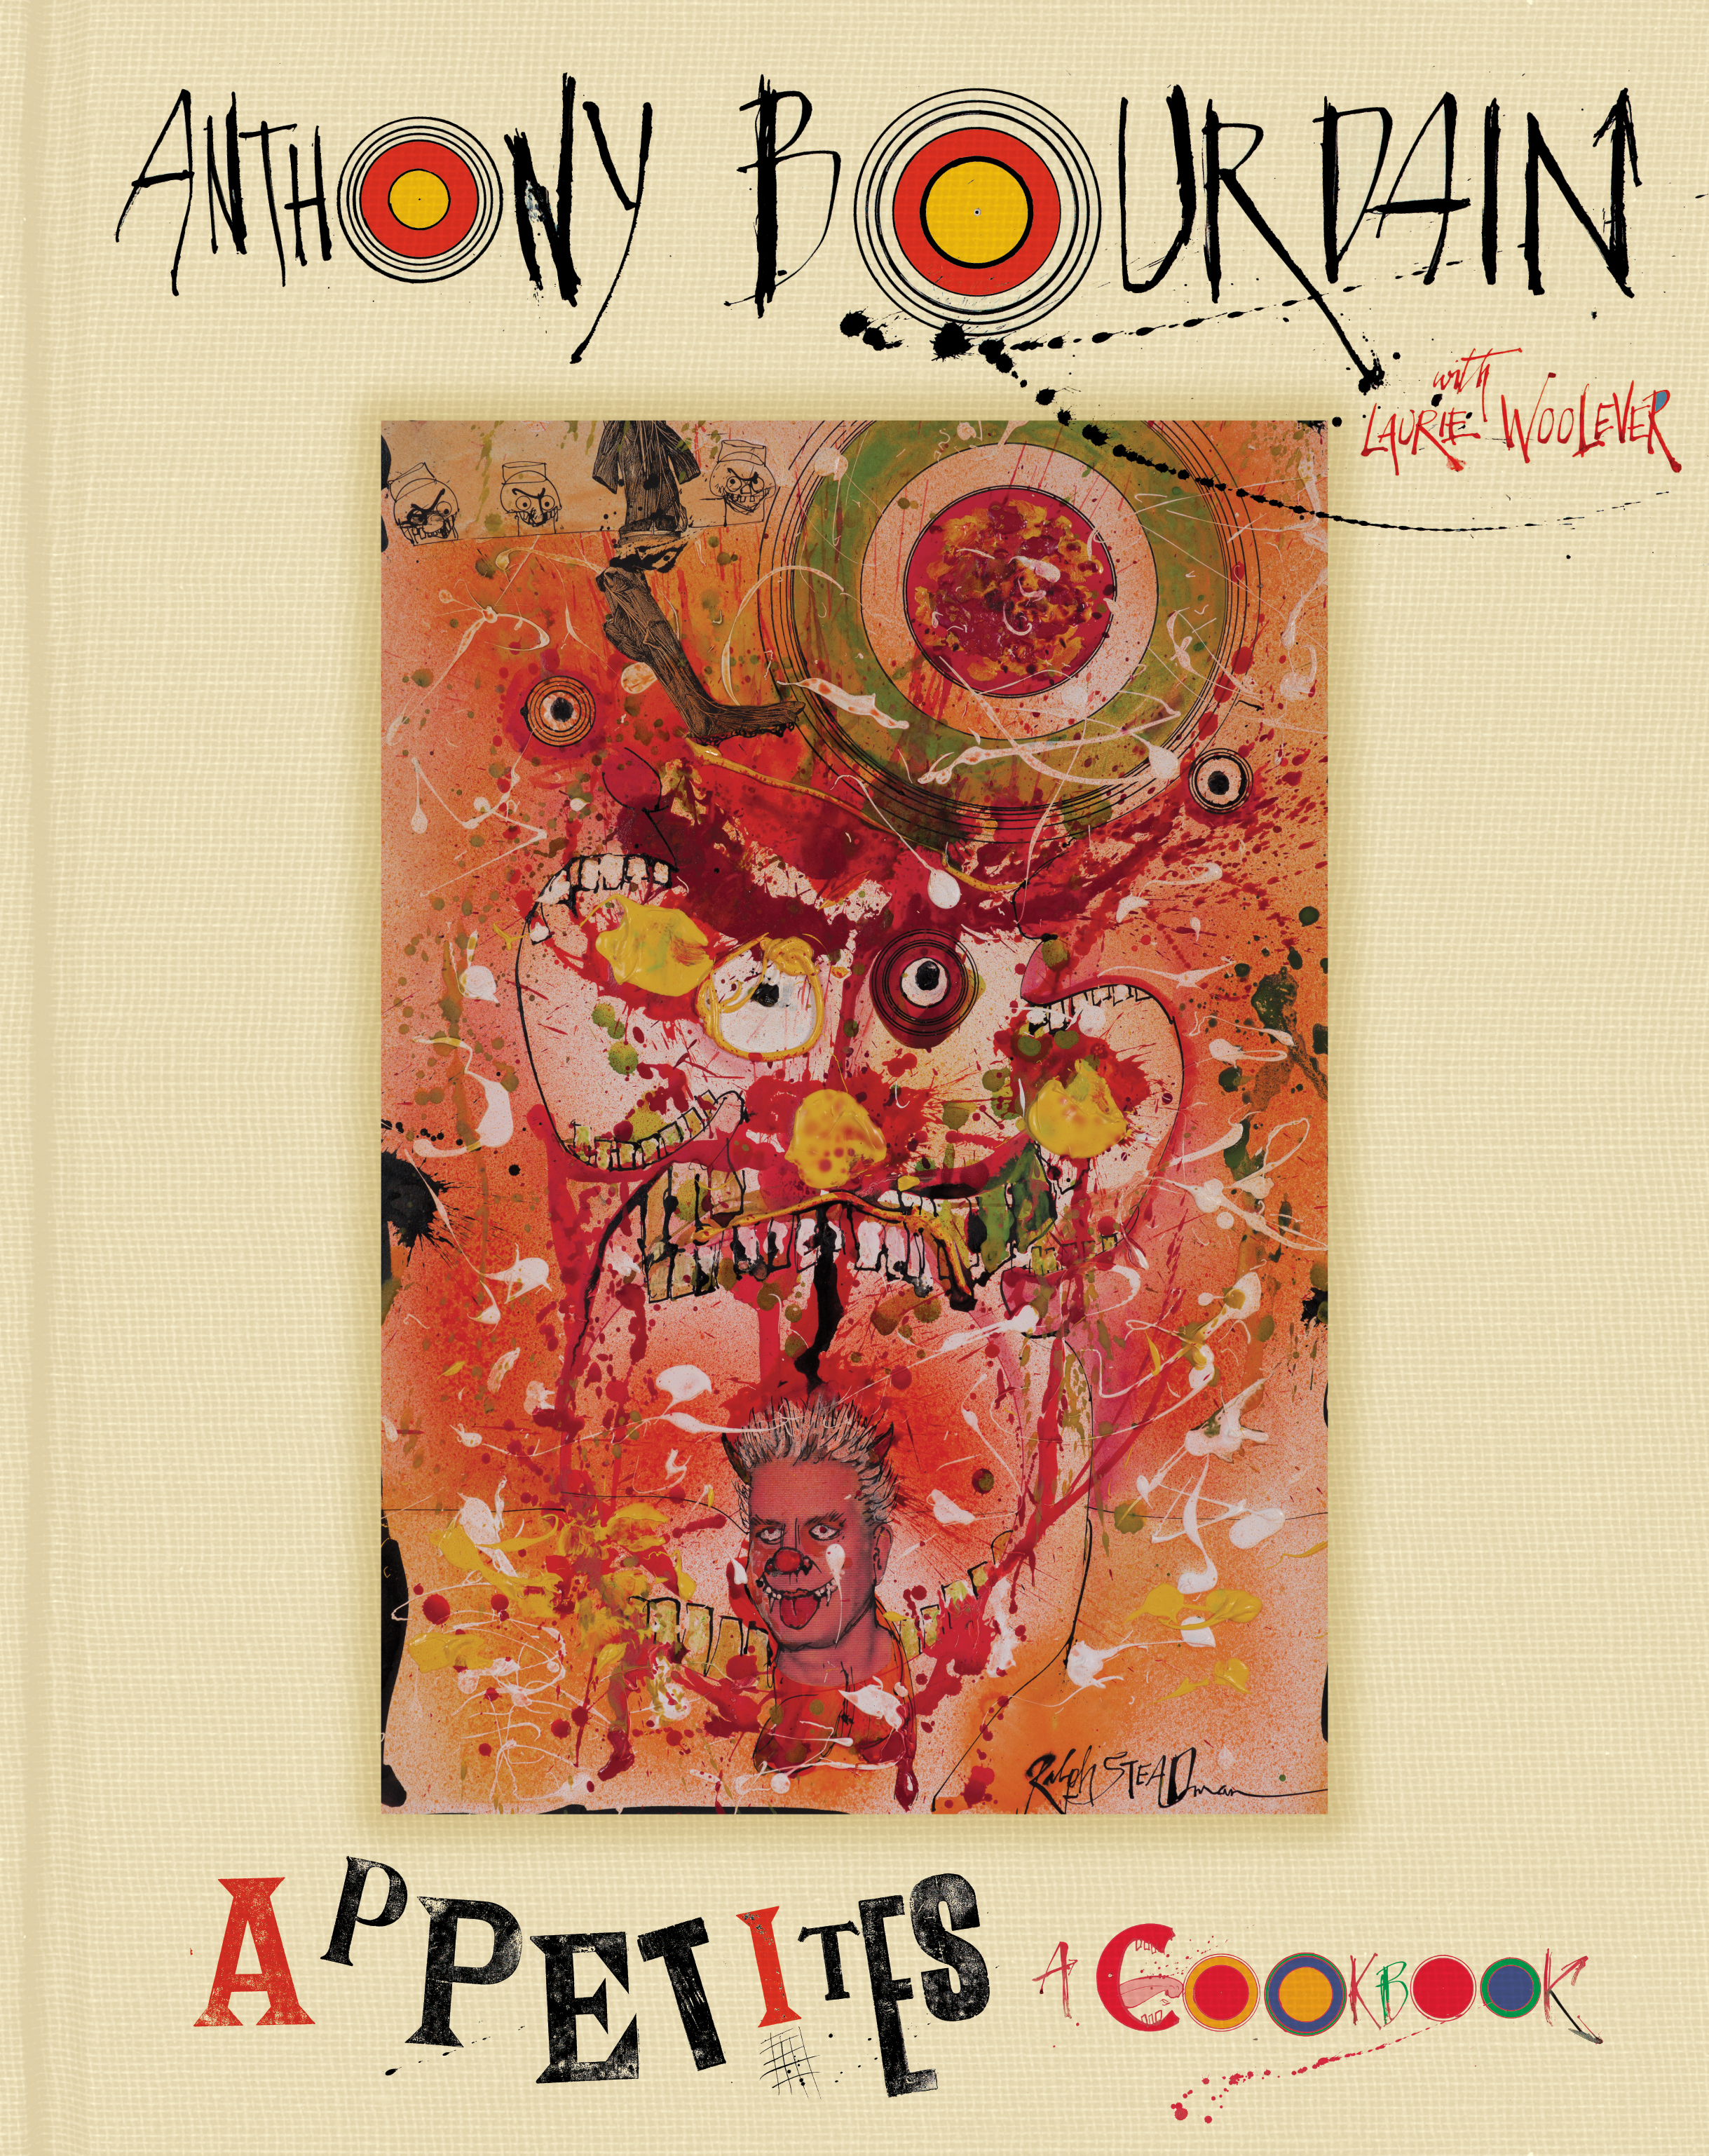 https://www.amazon.com/Appetites-Cookbook-Anthony-Bourdain/dp/0062409956